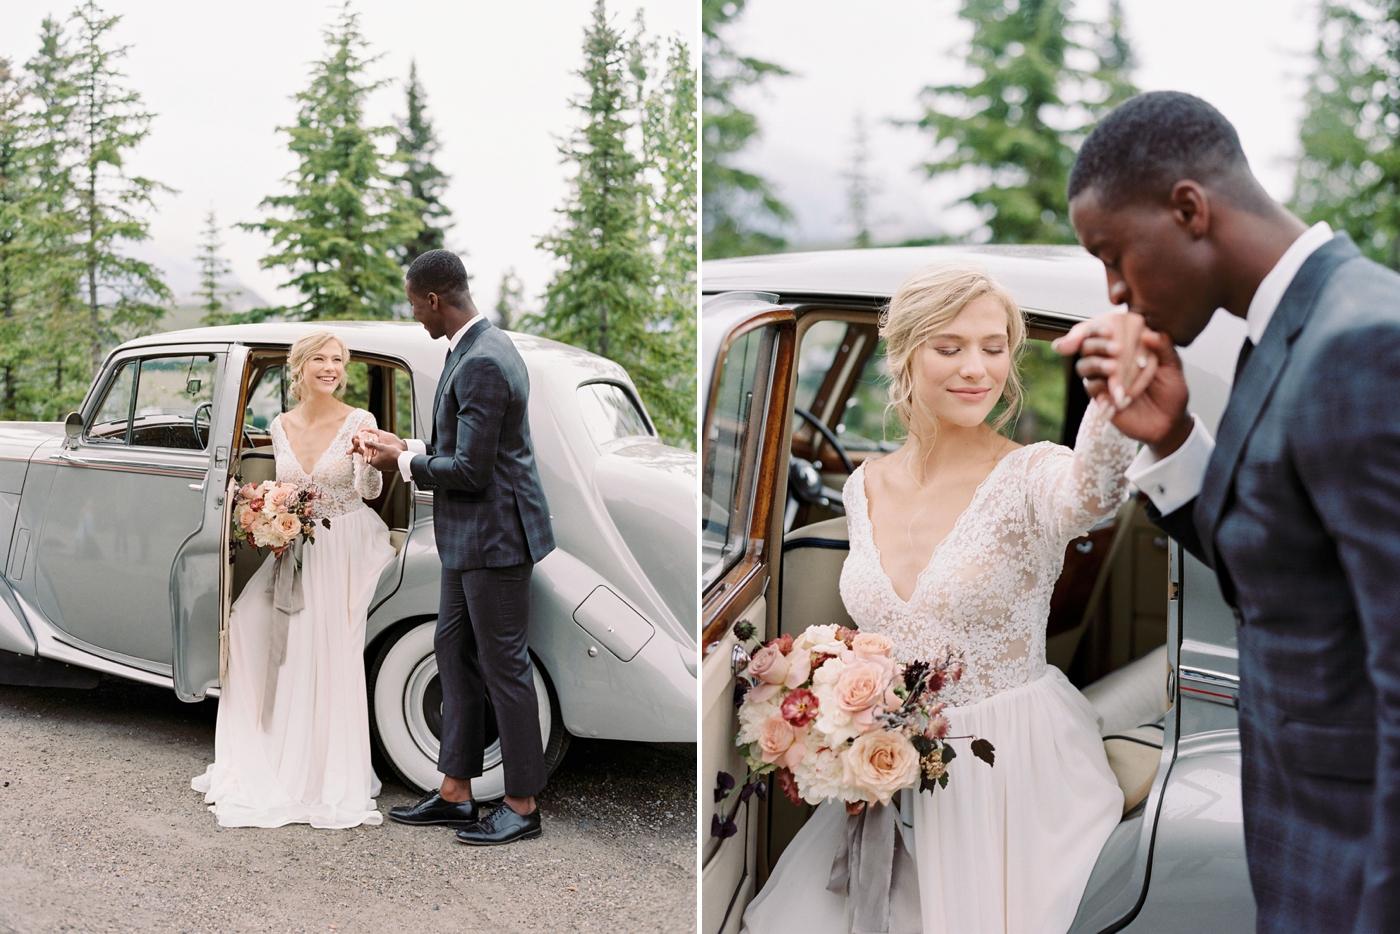 Stacey Foley Design Joy Wed Fine Art Series Photography Workshop | Banff wedding photographers | Rimrock resort wedding | bride and groom portraits with vintage rolls royce banff wedding photographers